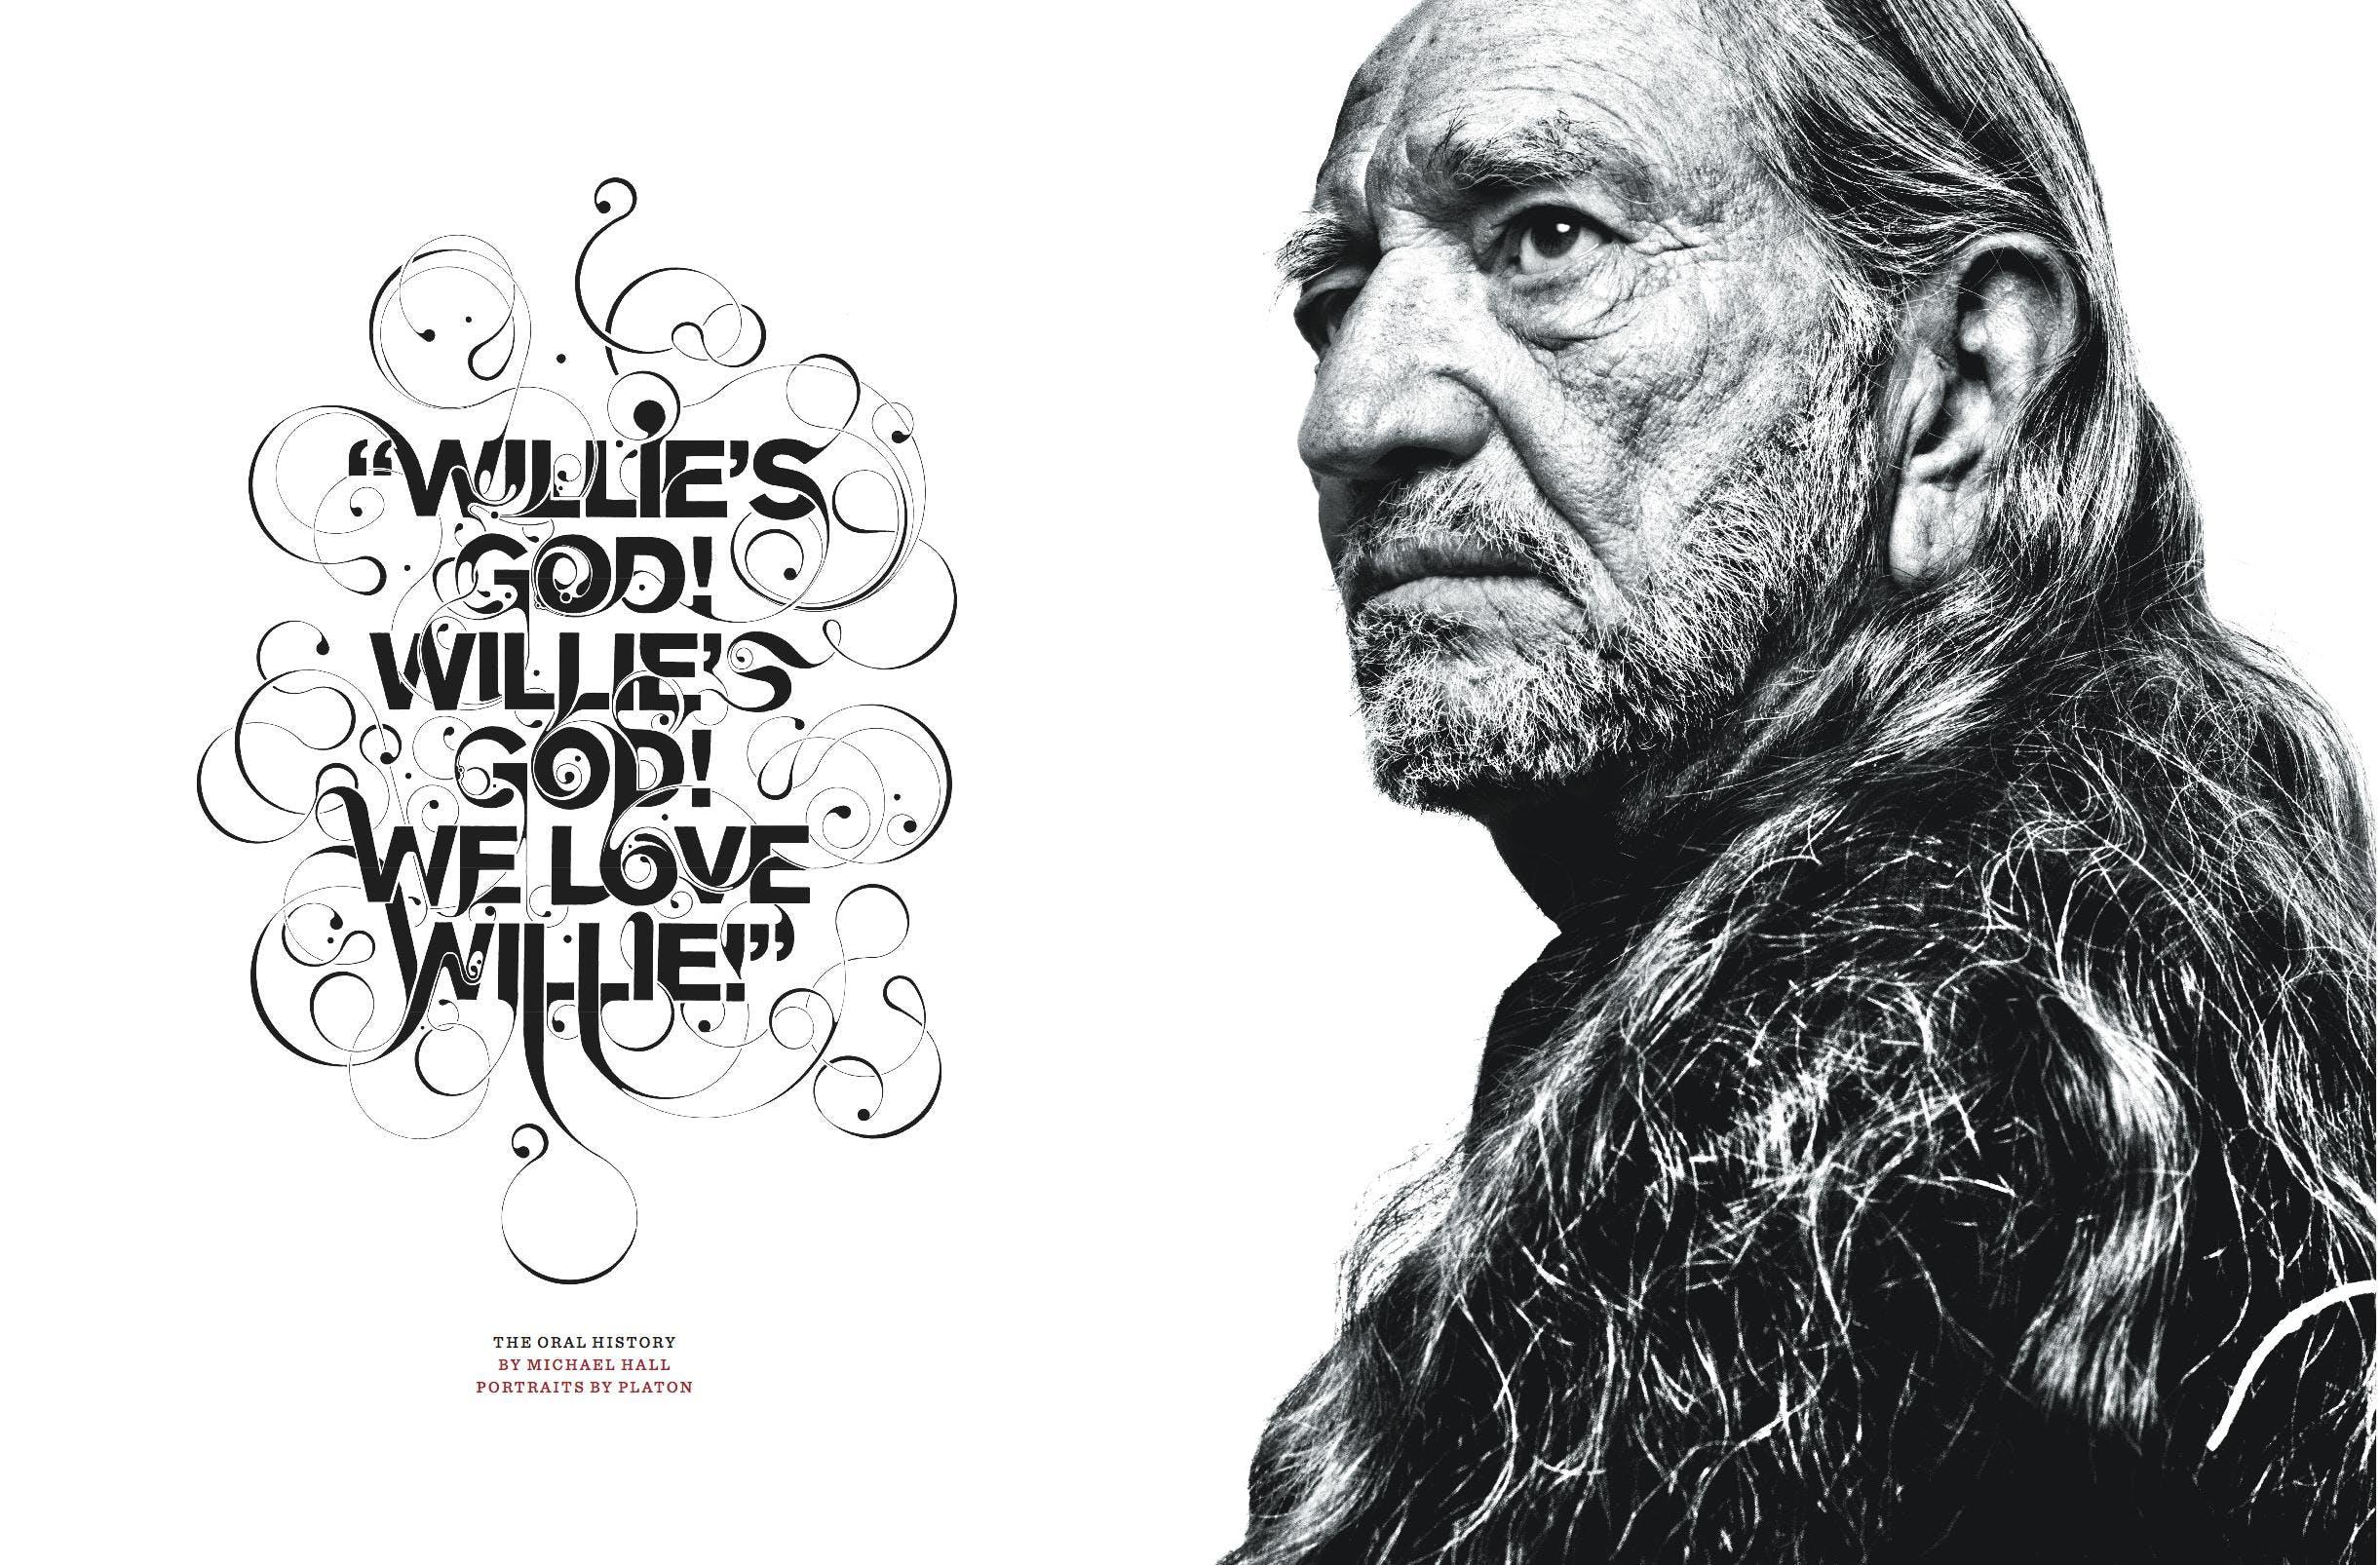 Willies God1 - 0001